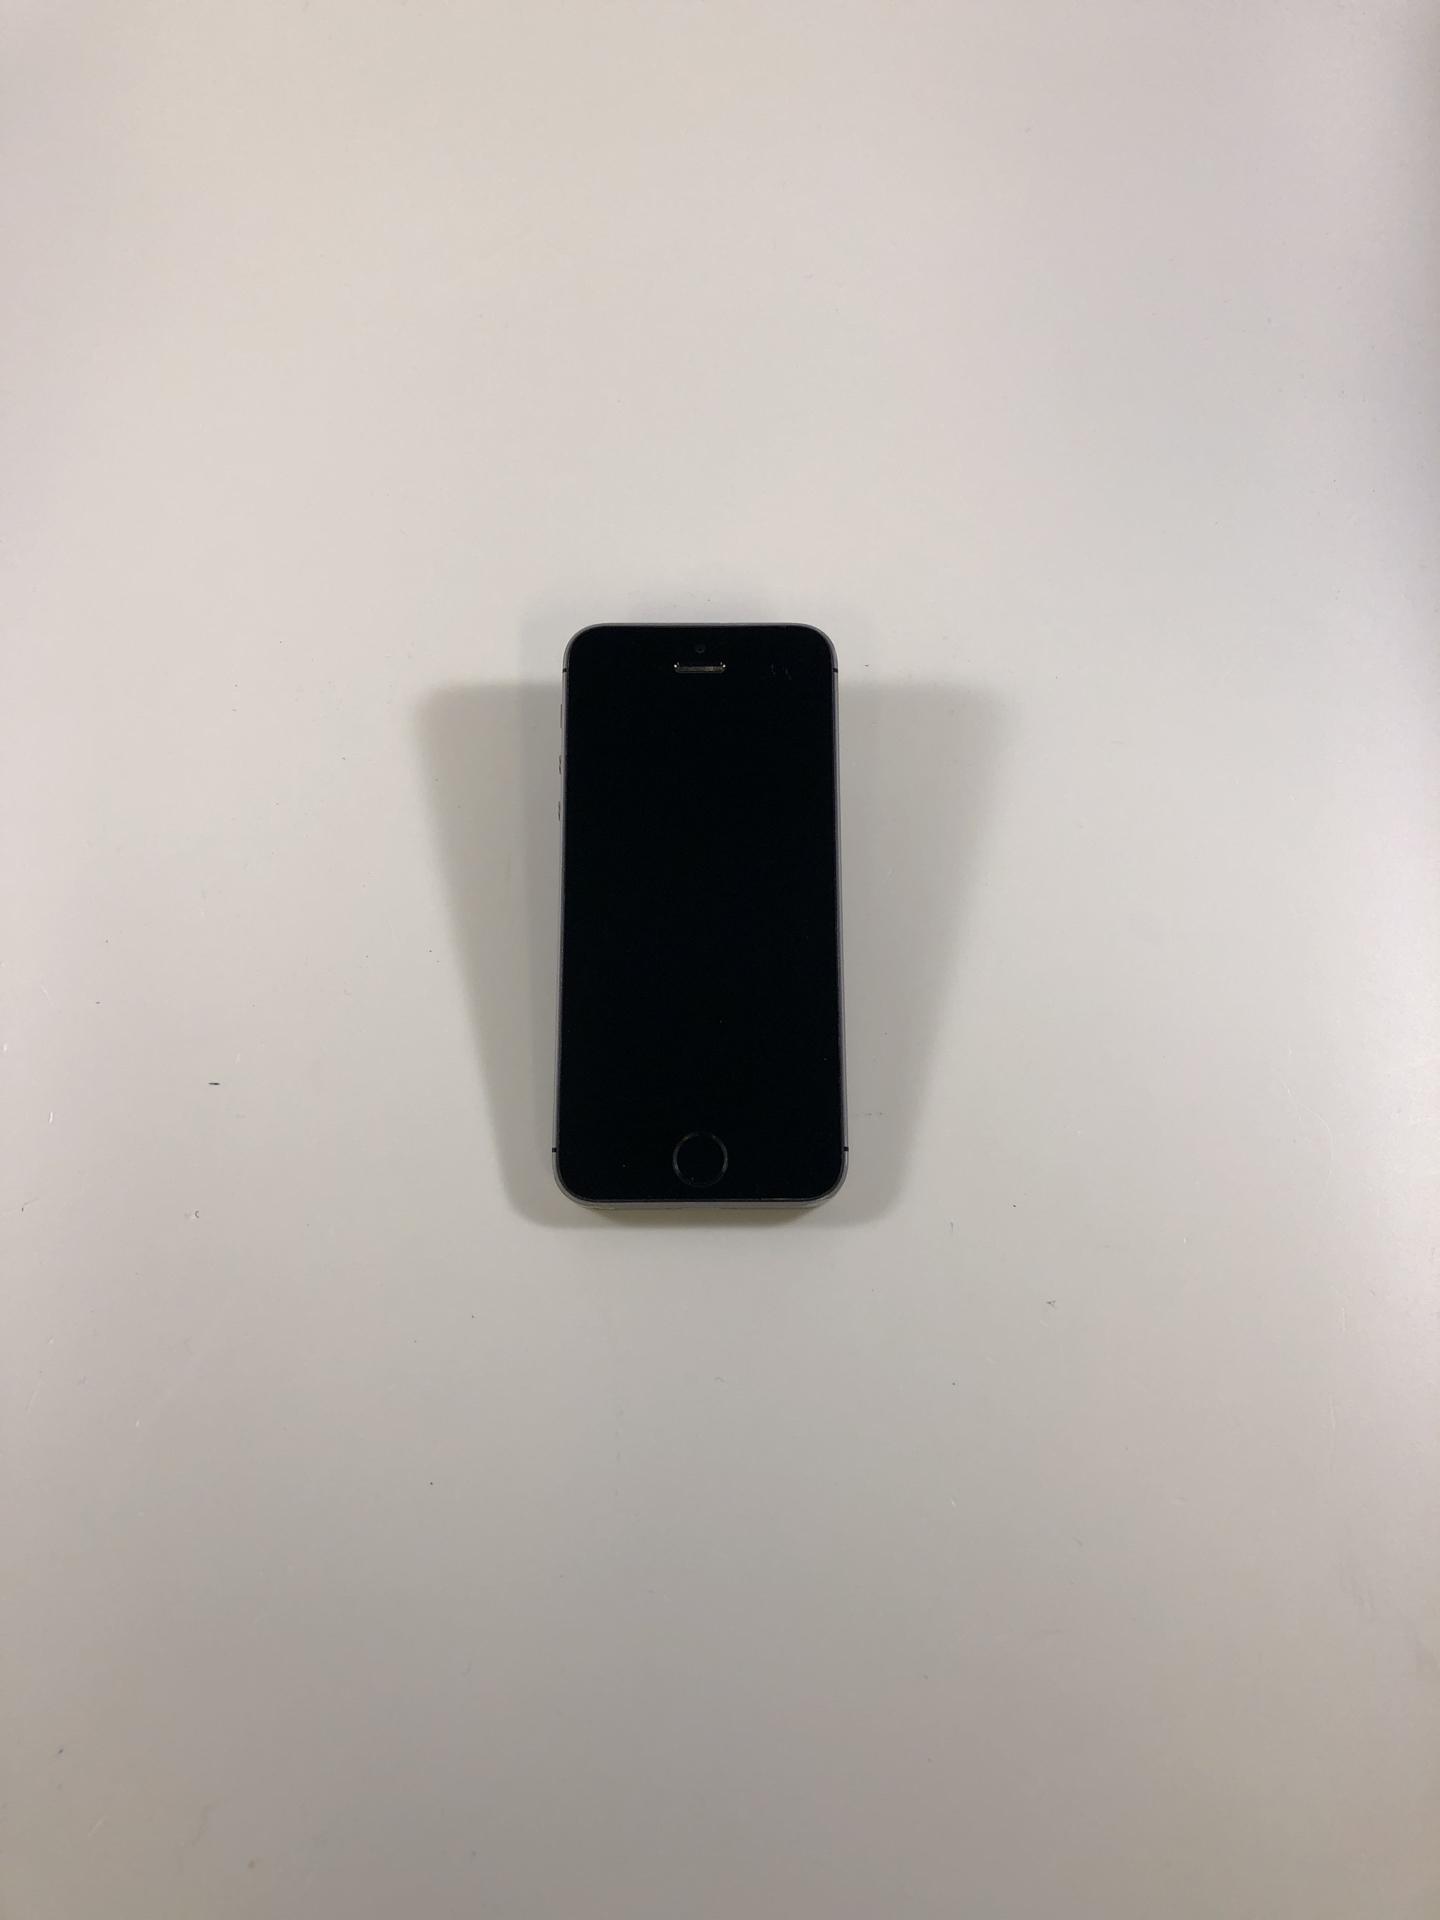 iPhone SE 16GB, 16GB, Space Gray, Kuva 1